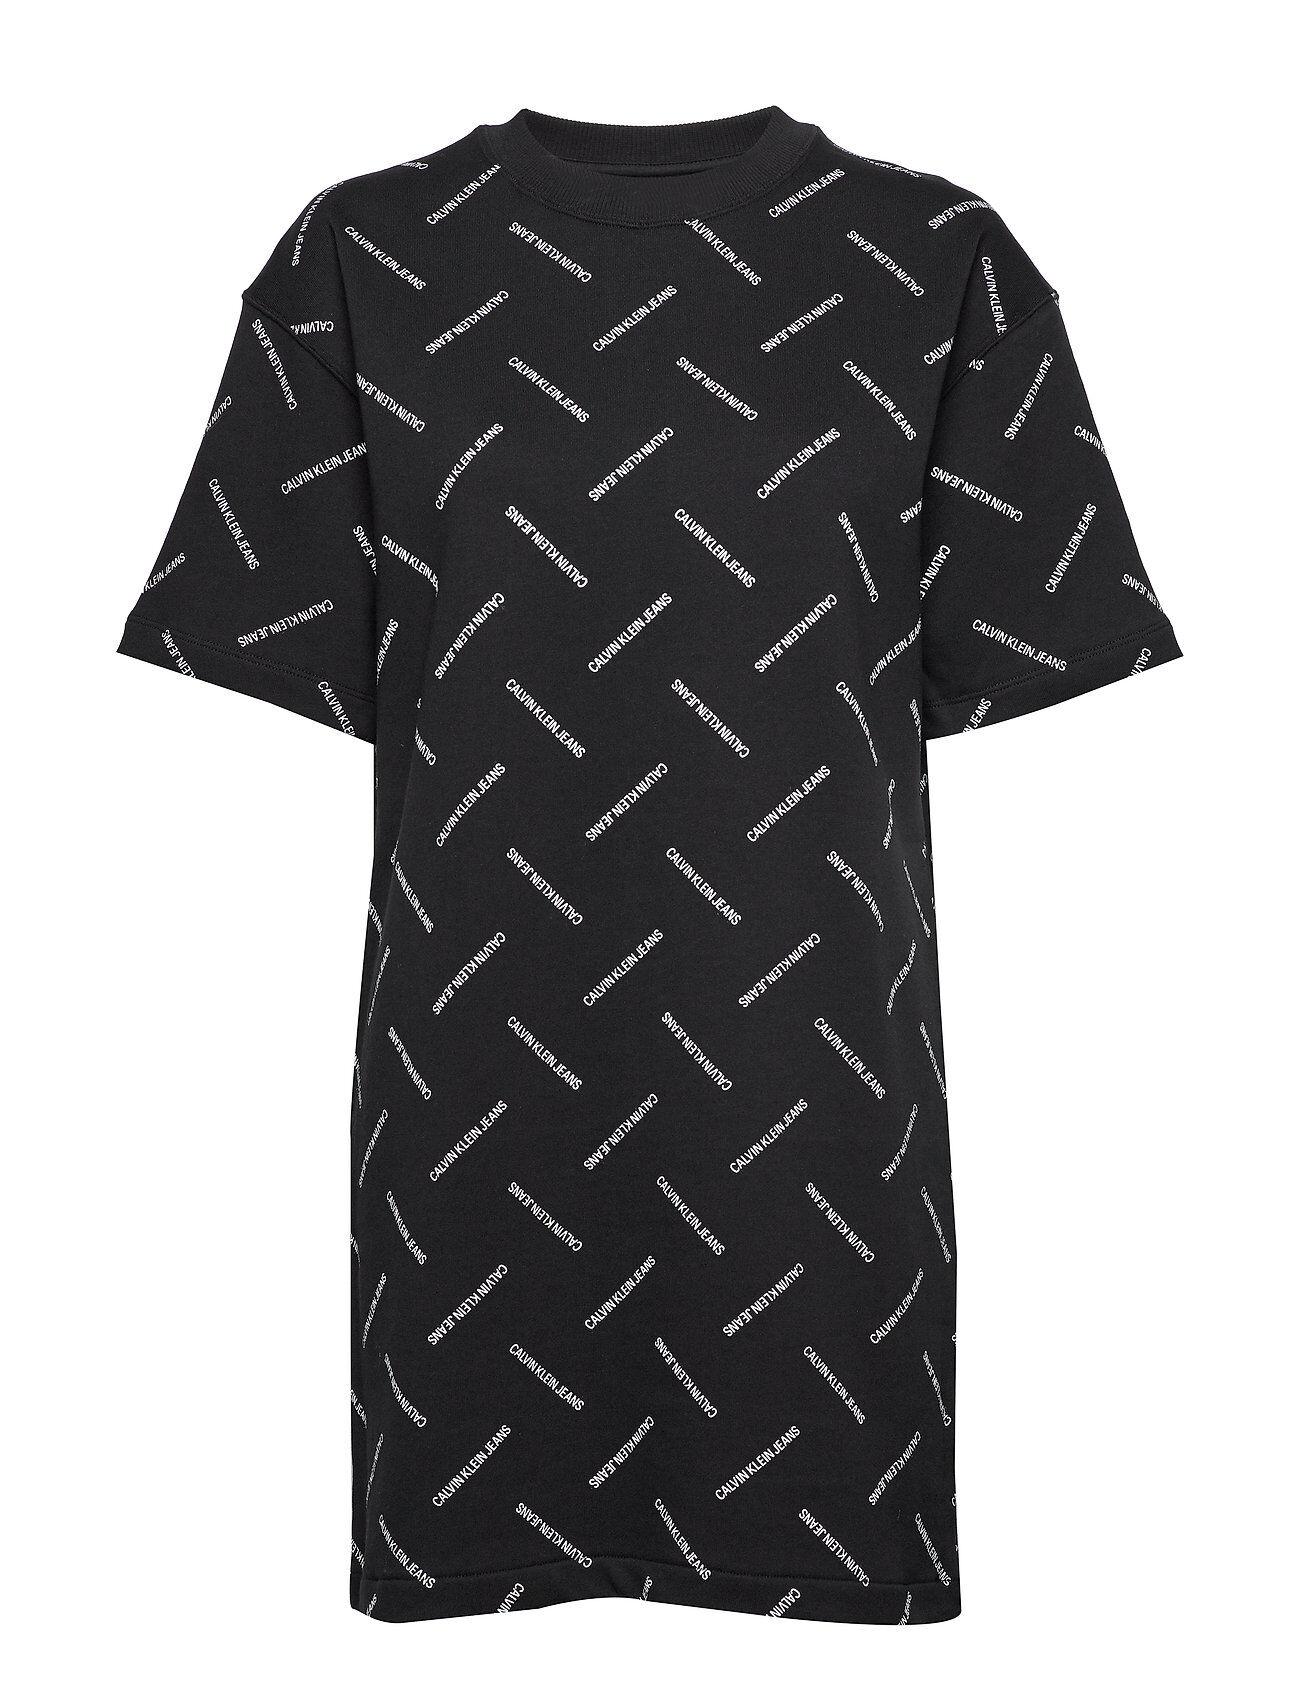 Image of Calvin Diagonal Logo T-Shirt Dress Lyhyt Mekko Sininen Calvin Klein Jeans